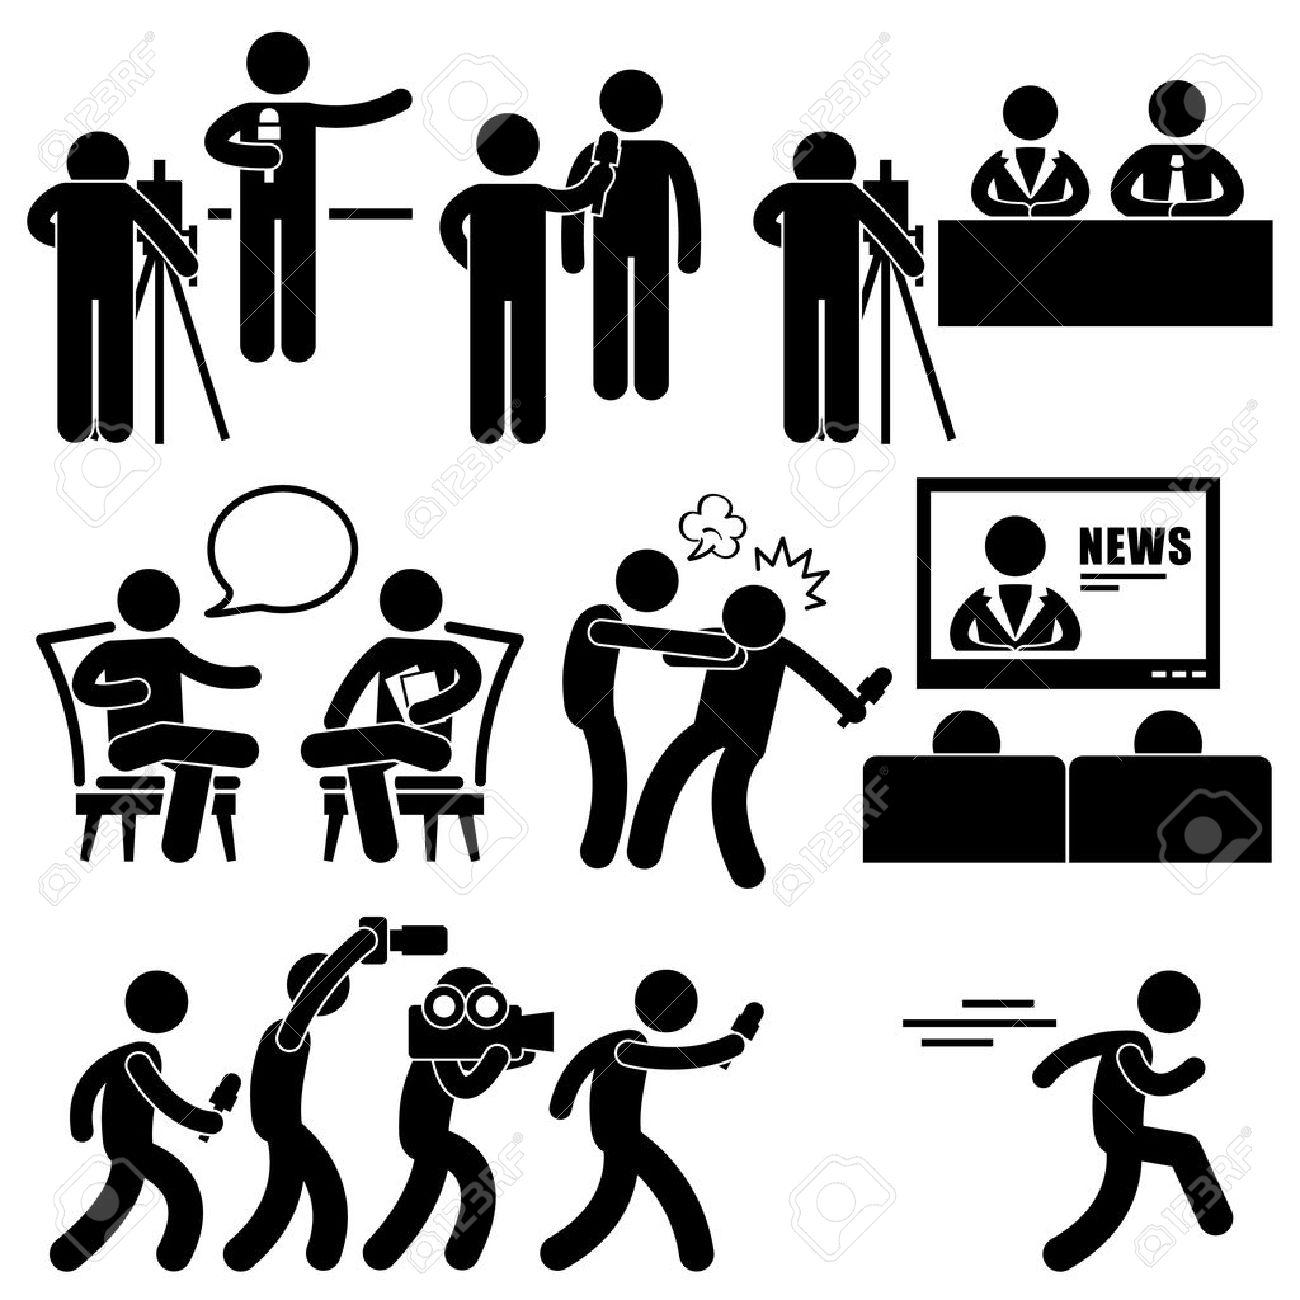 News Reporter Anchor Woman Newsroom Man Talk Show Host Stick Figure Pictogram Icon Stock Vector - 18452153